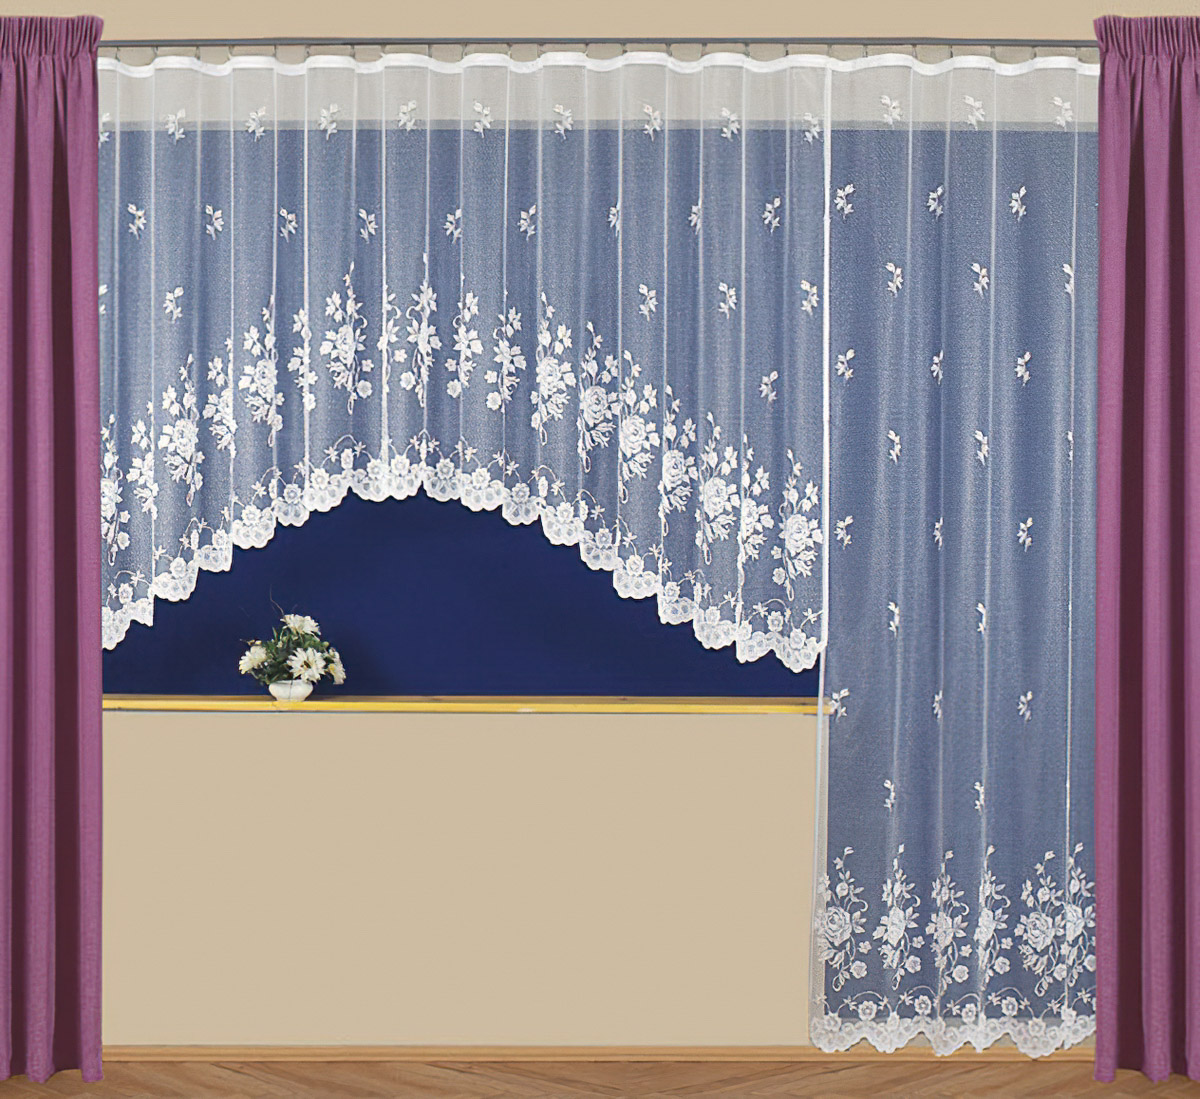 Tylex kusová záclona LOSTRIS jednobarevná bílá, výška 250 cm x šířka 180 cm (na dveře)